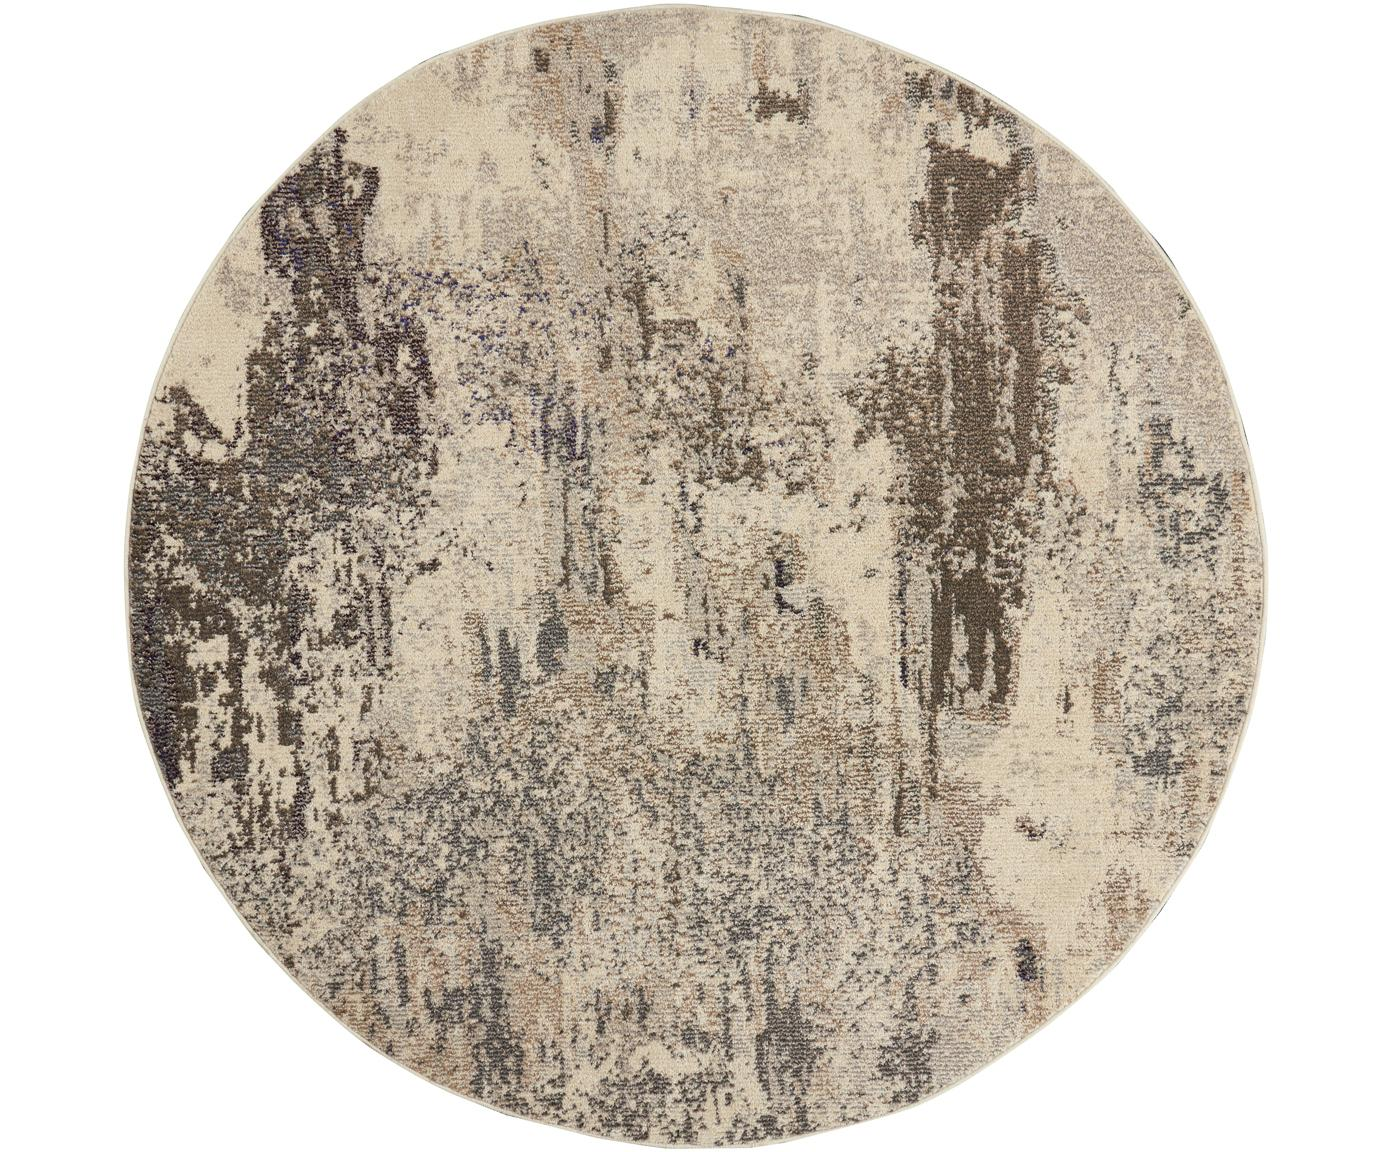 Runder Designteppich Celestial in Beige, Flor: 100% Polypropylen, Beigetöne, Ø 160 cm (Größe L)